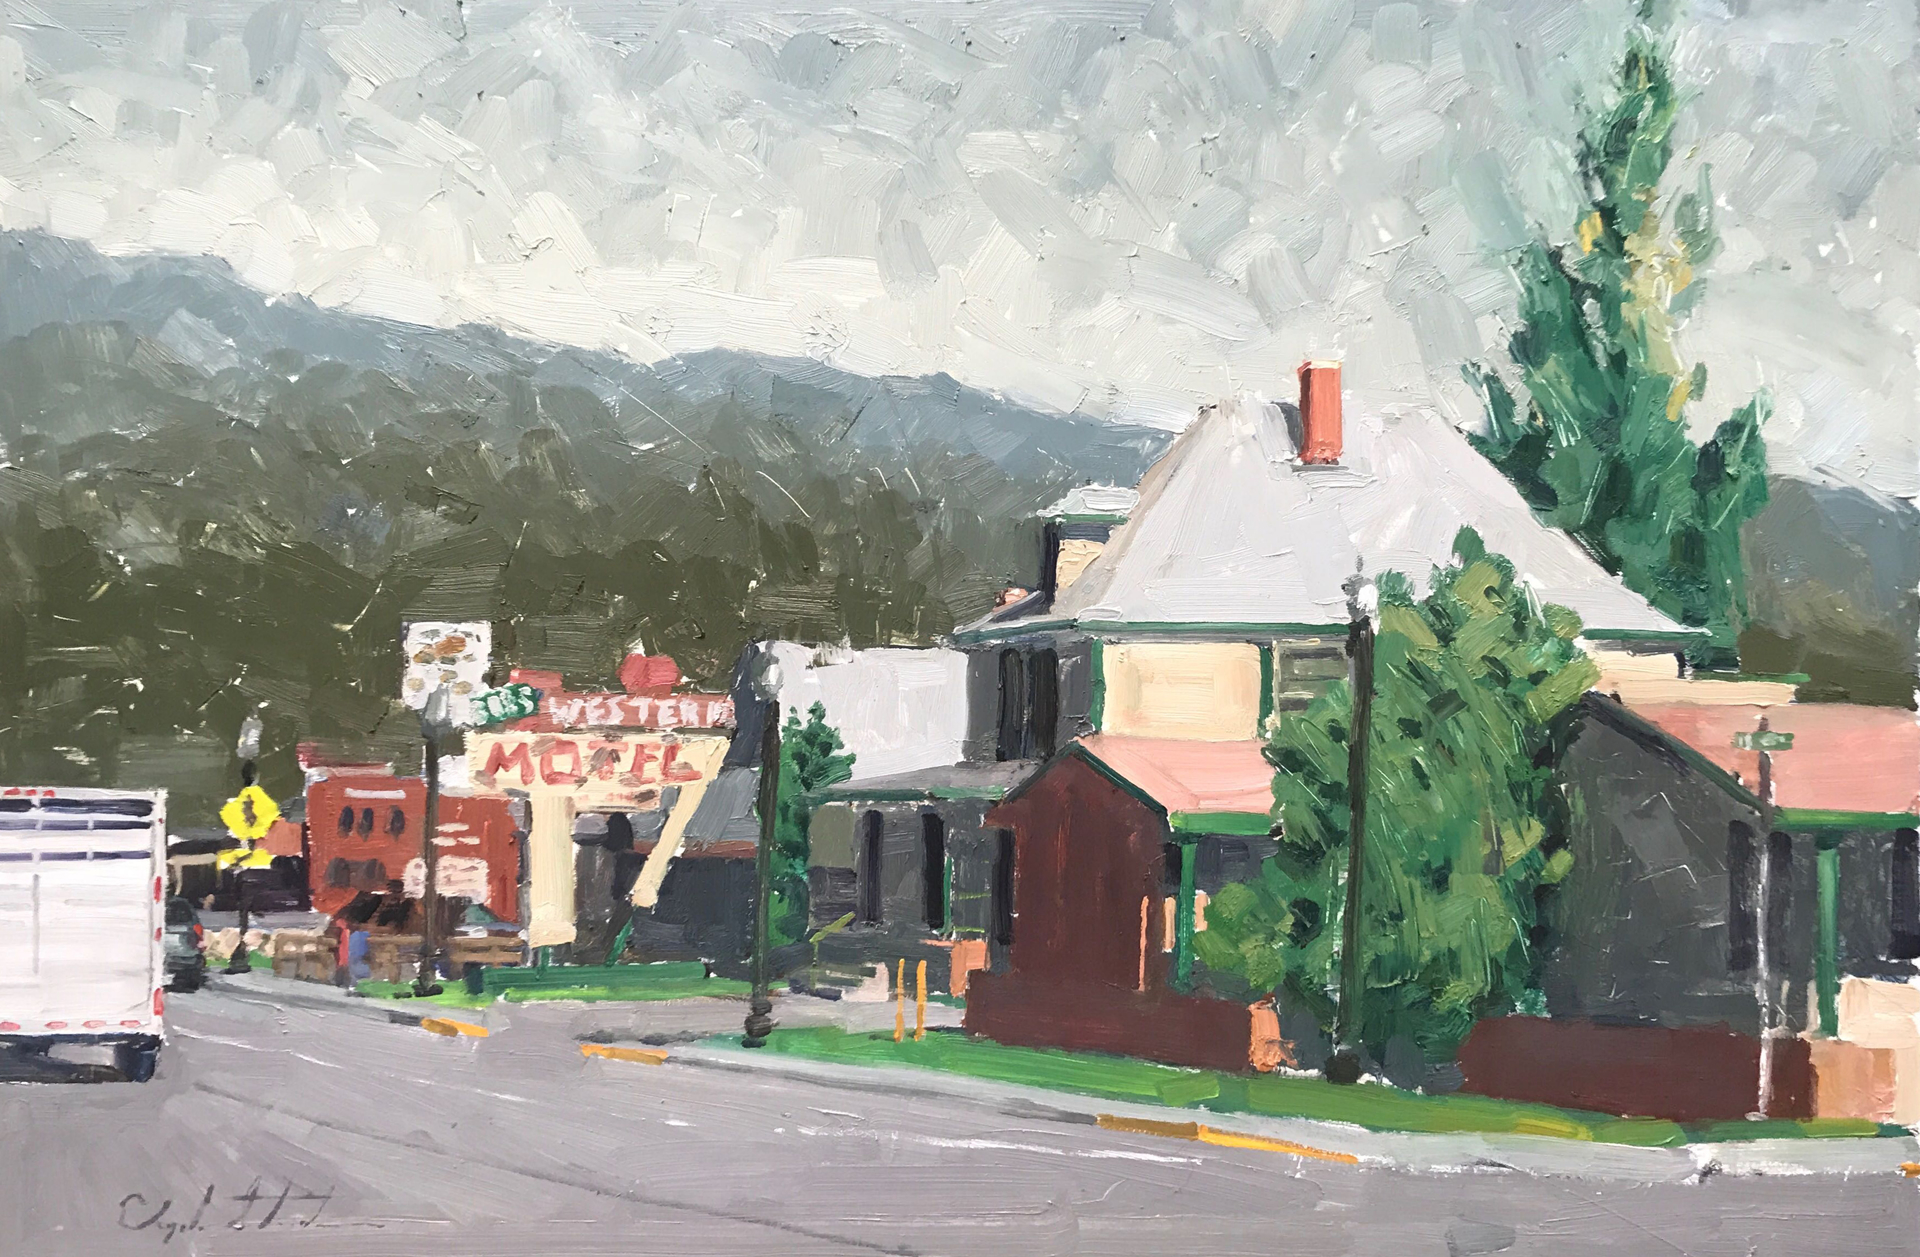 Western Motel by Clyde Steadman